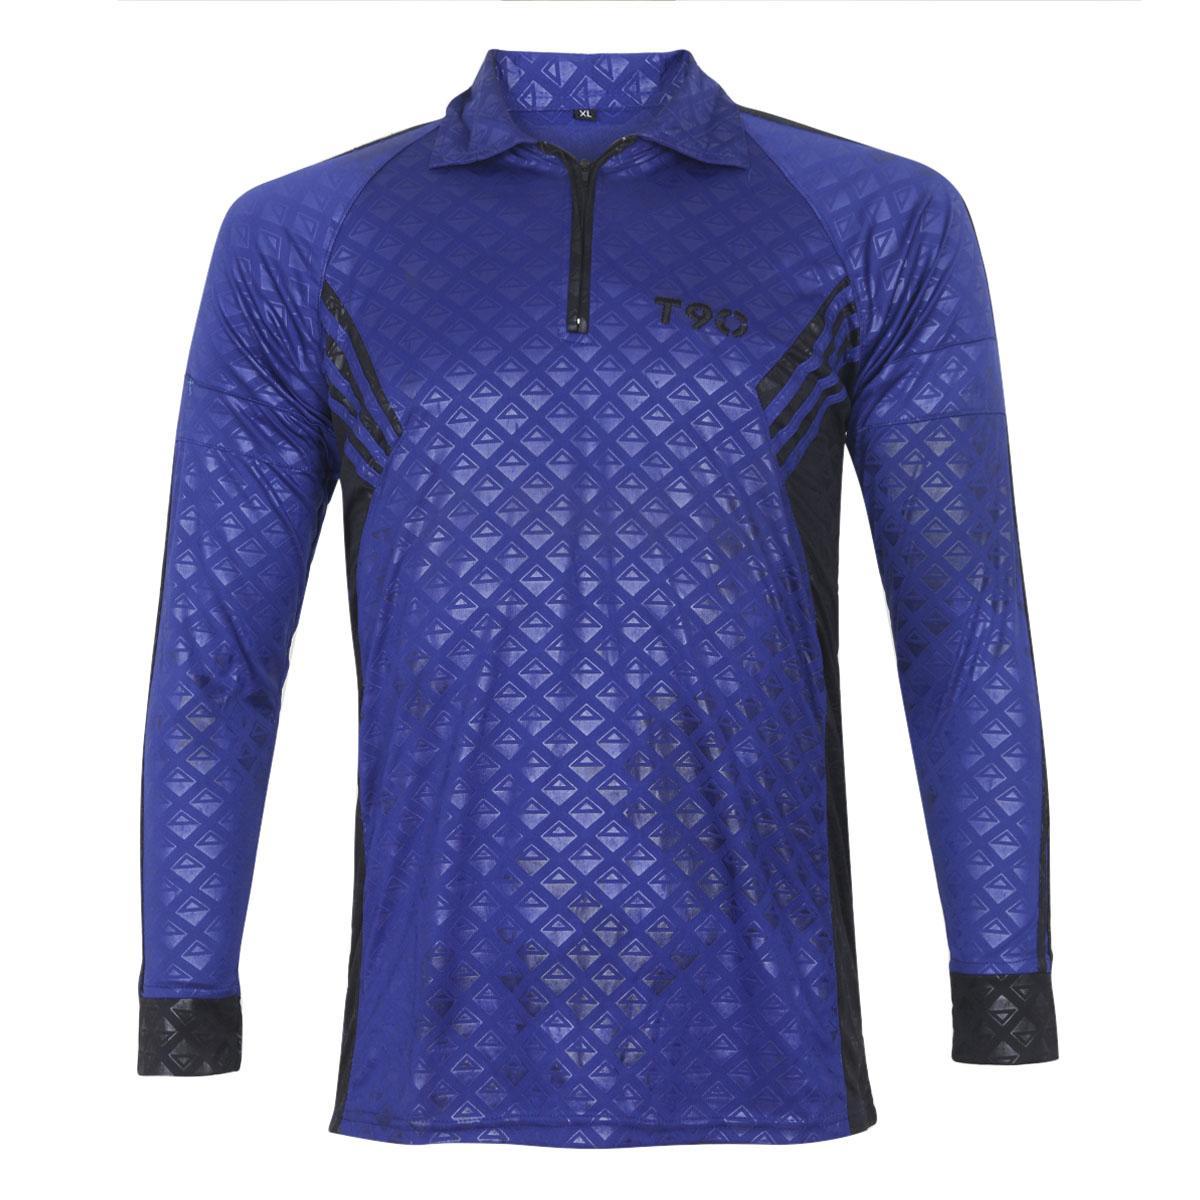 ffa89c9627e Sportswear for Men - Men s Sports Clothing Online - Daraz.com.bd